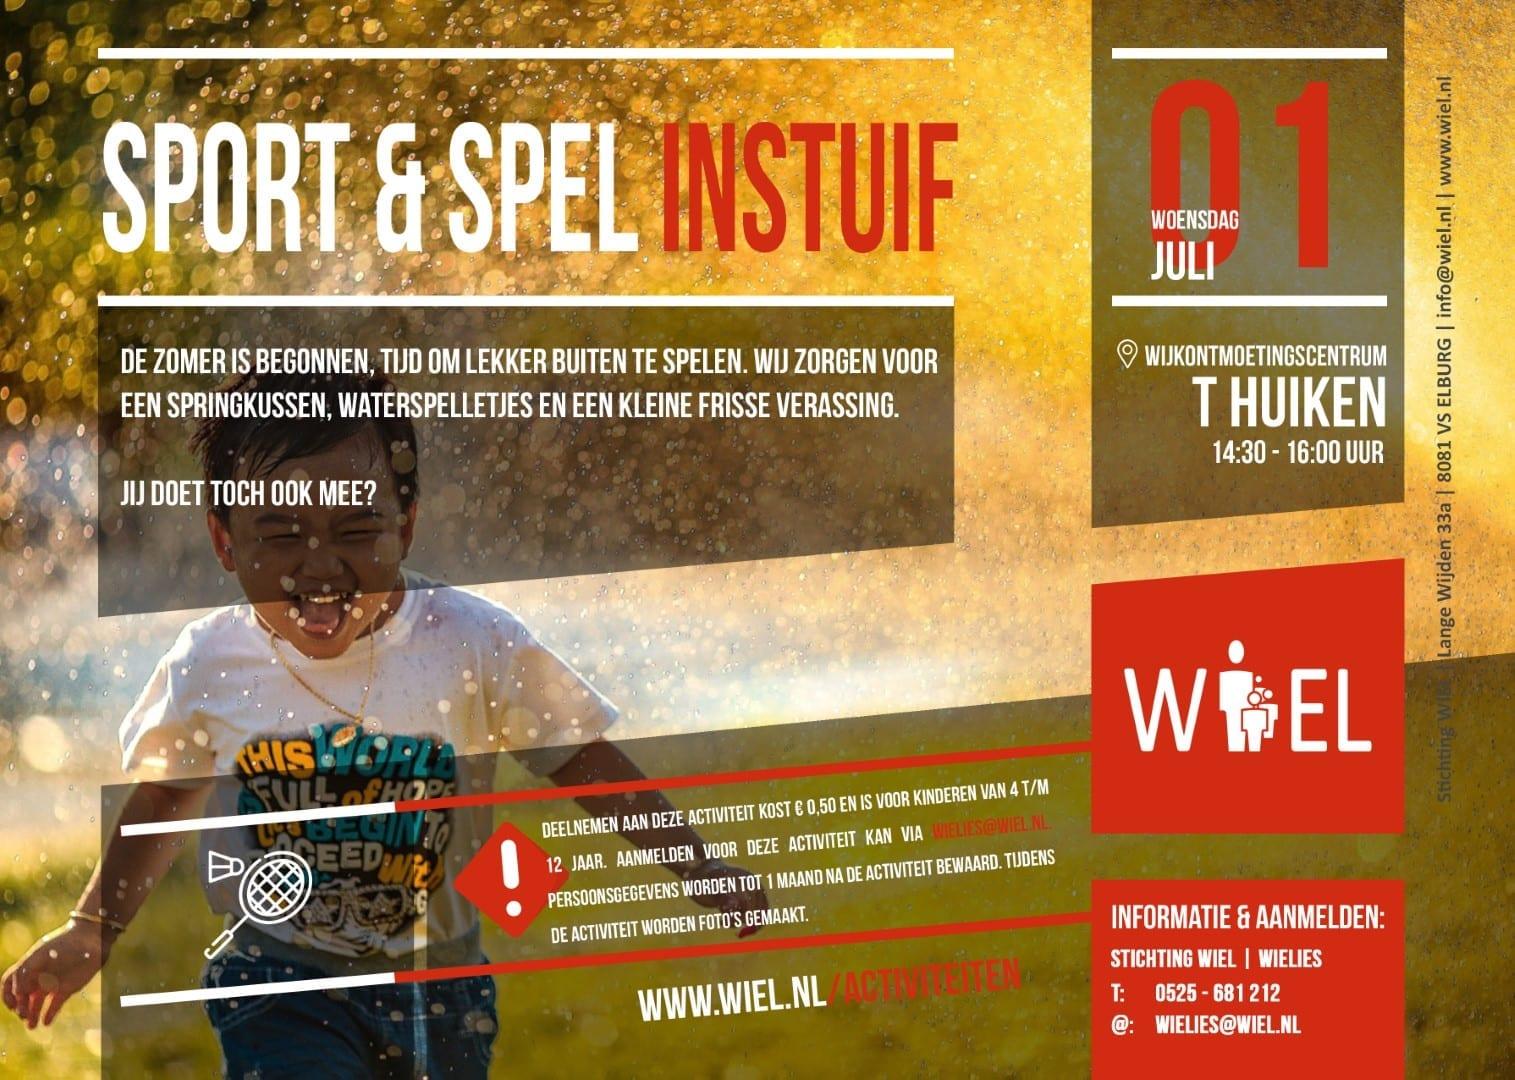 Sport&Spel instuif